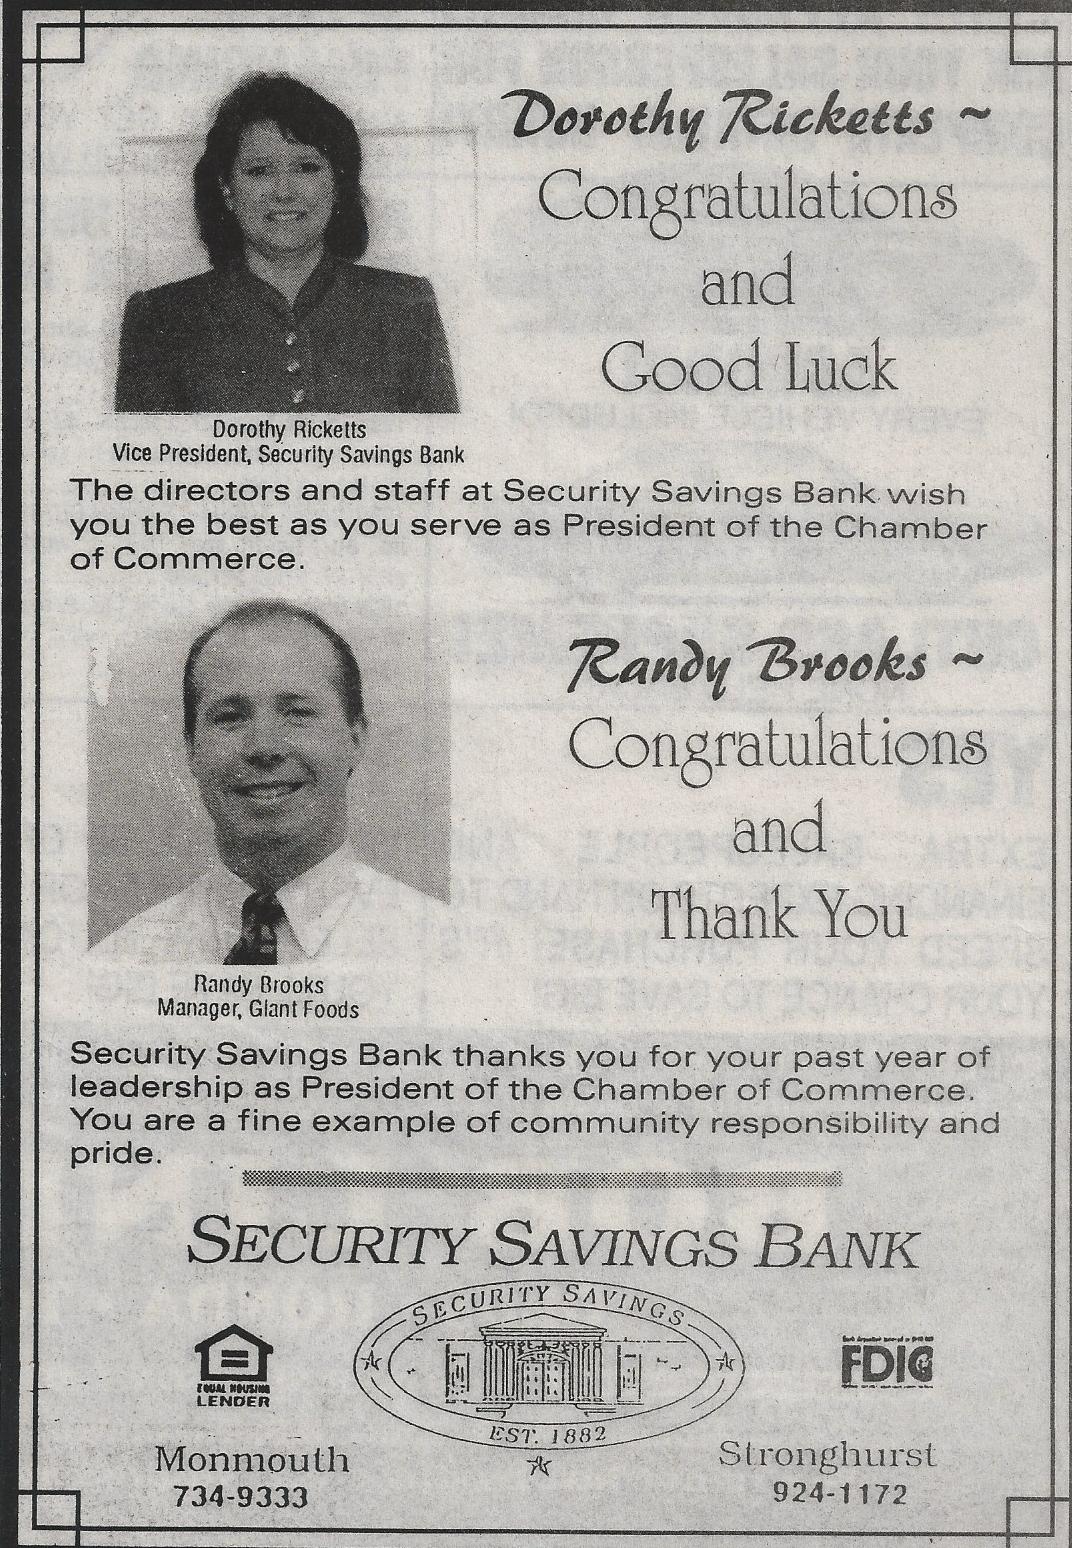 Security Savings congradulations